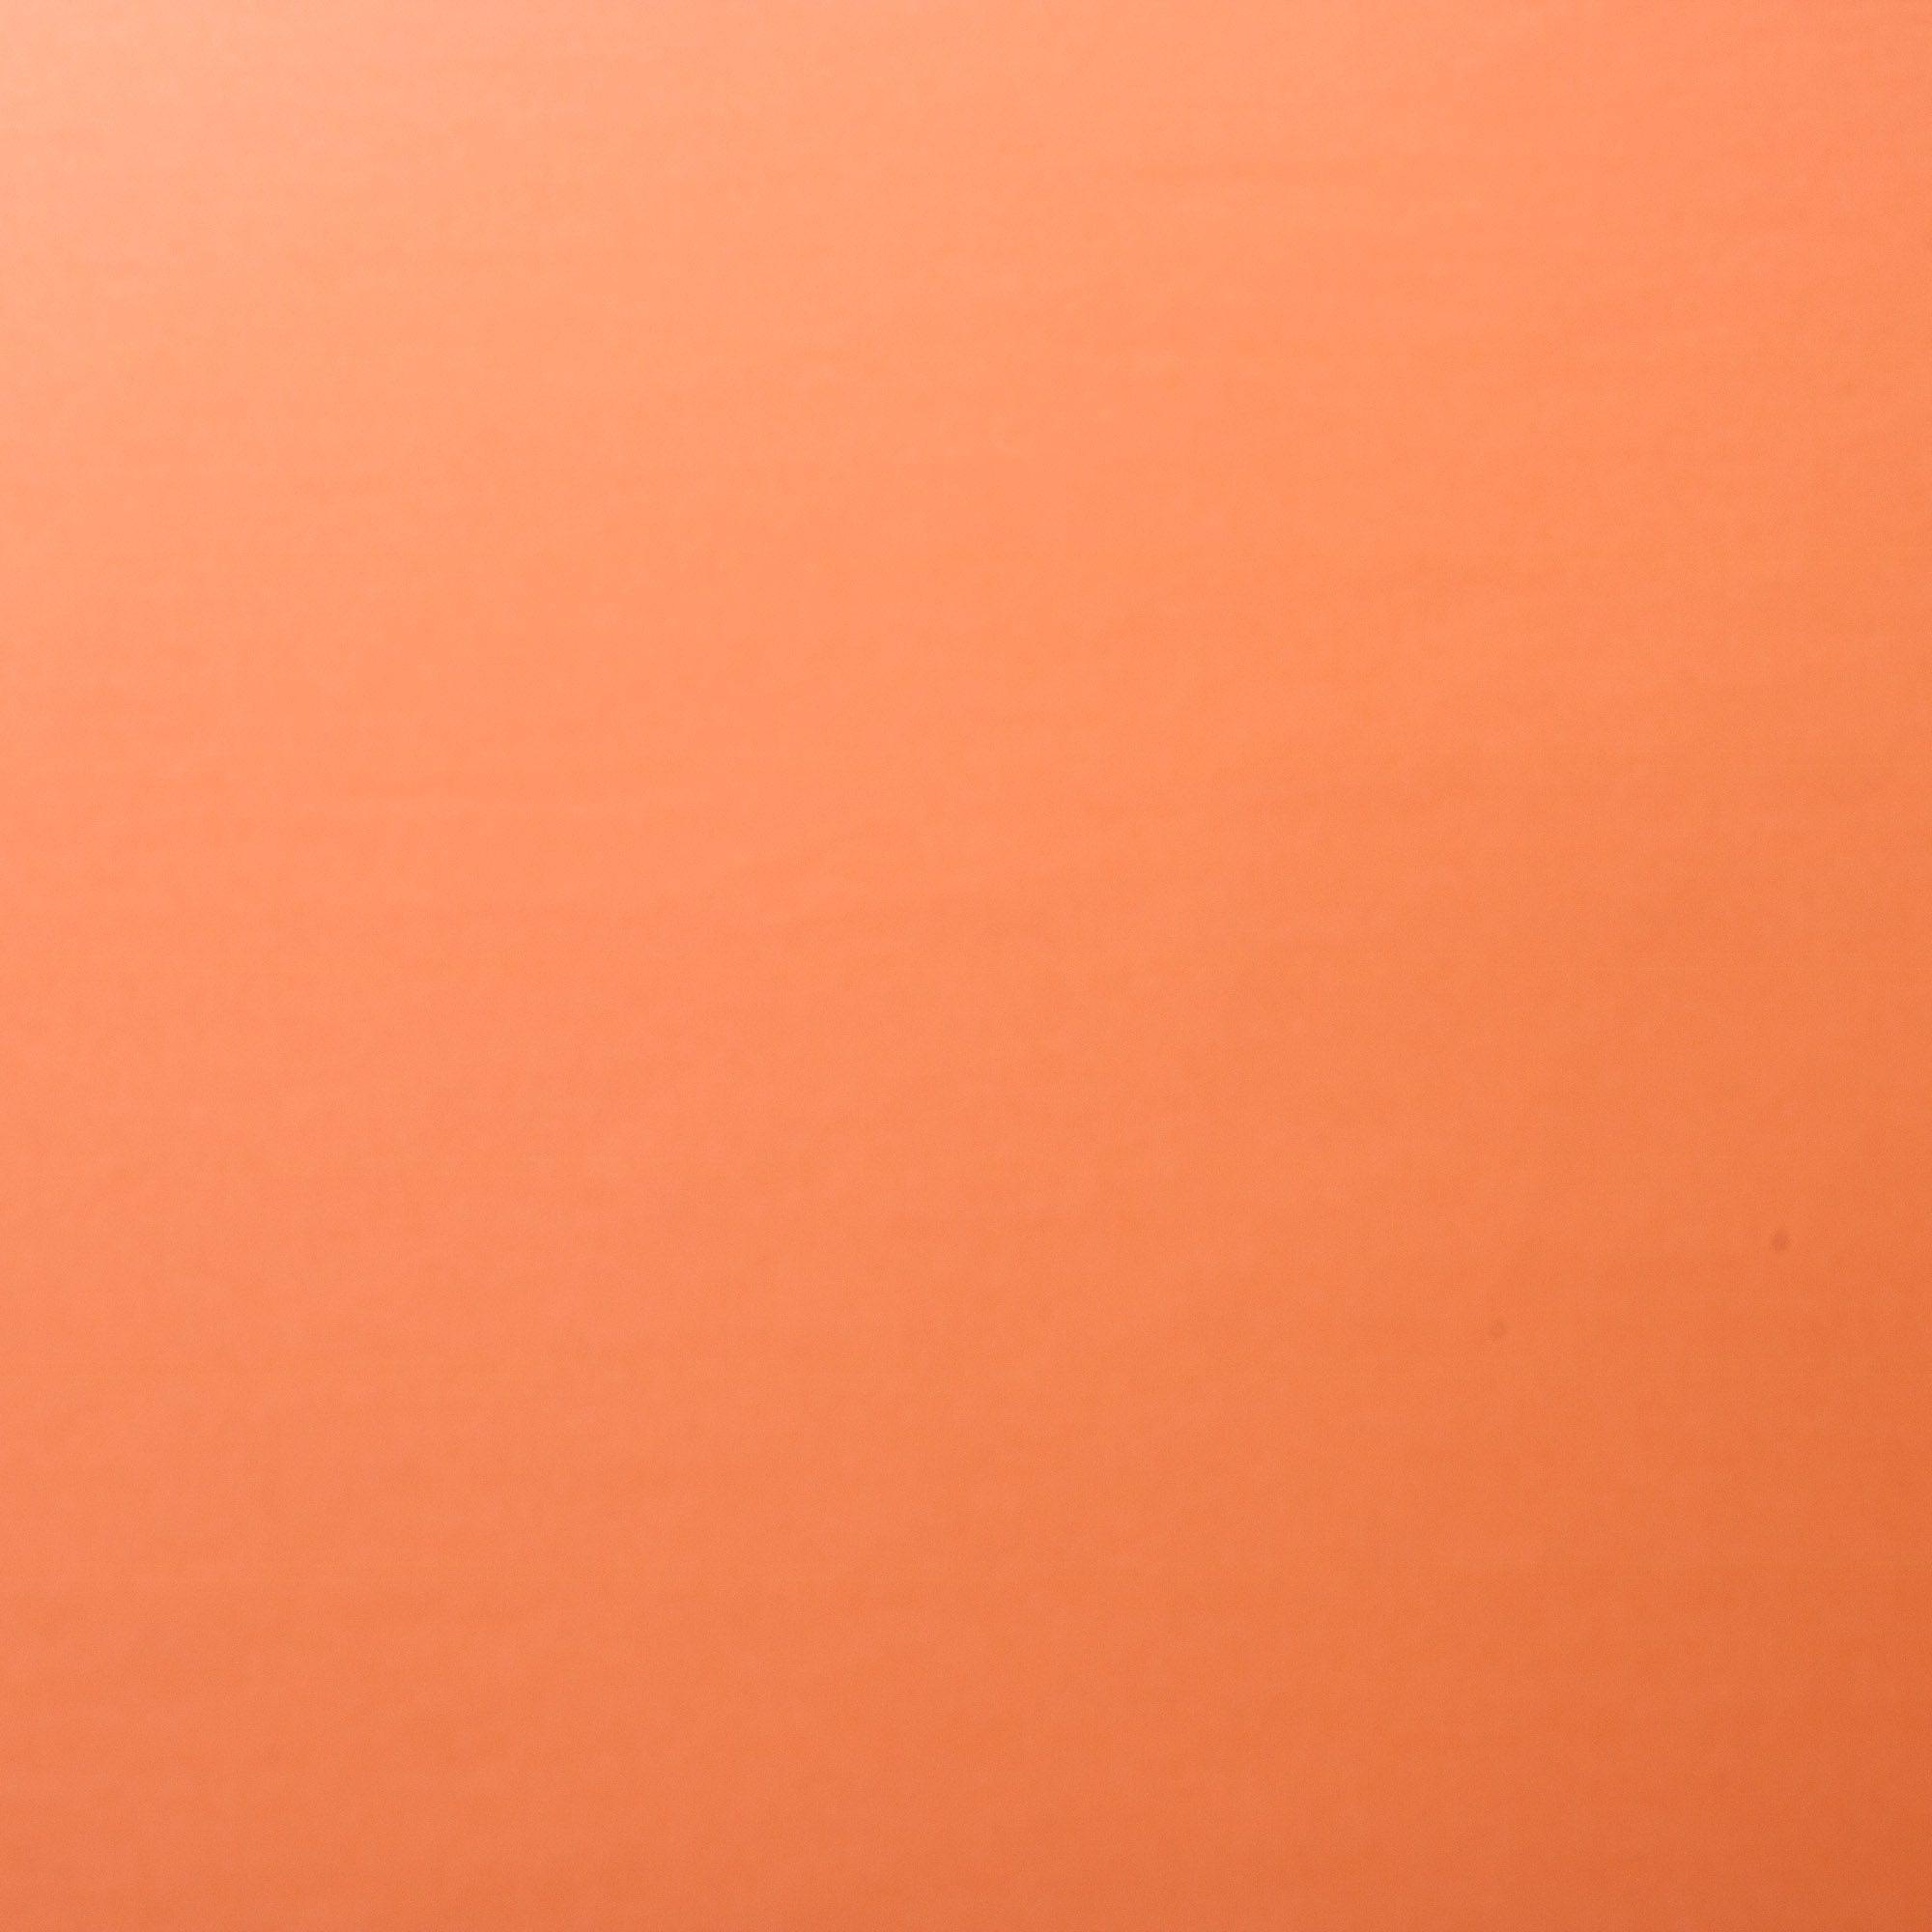 Tecido Malha Helanca Light Abobora Neon 100% Poliester 1,80 mt Largura